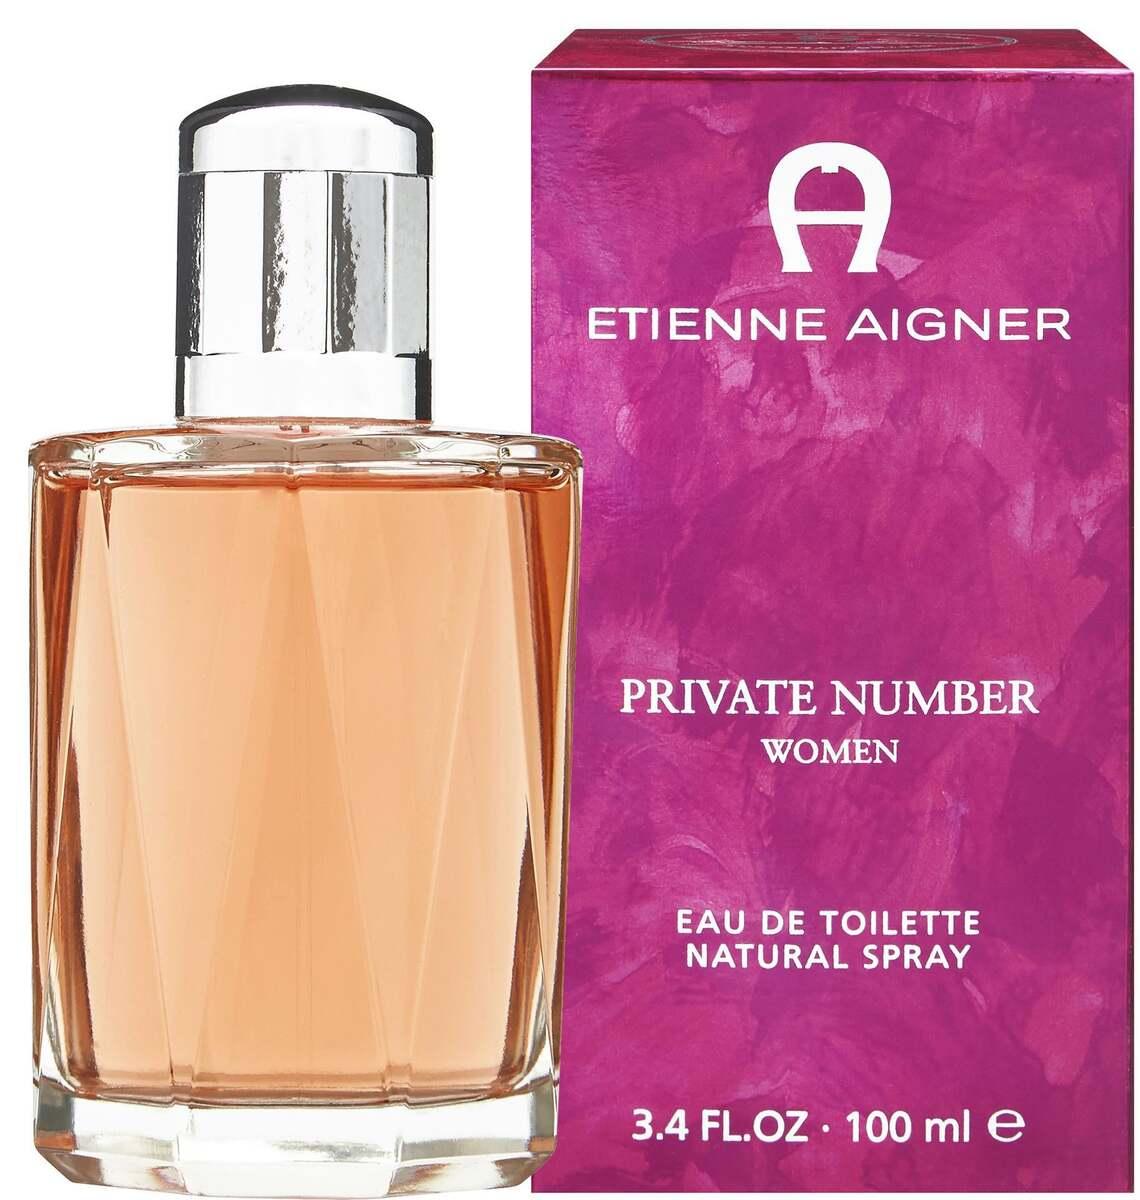 Bild 3 von Etienne Aigner Private Number Women Eau de Toilette Natural Spray